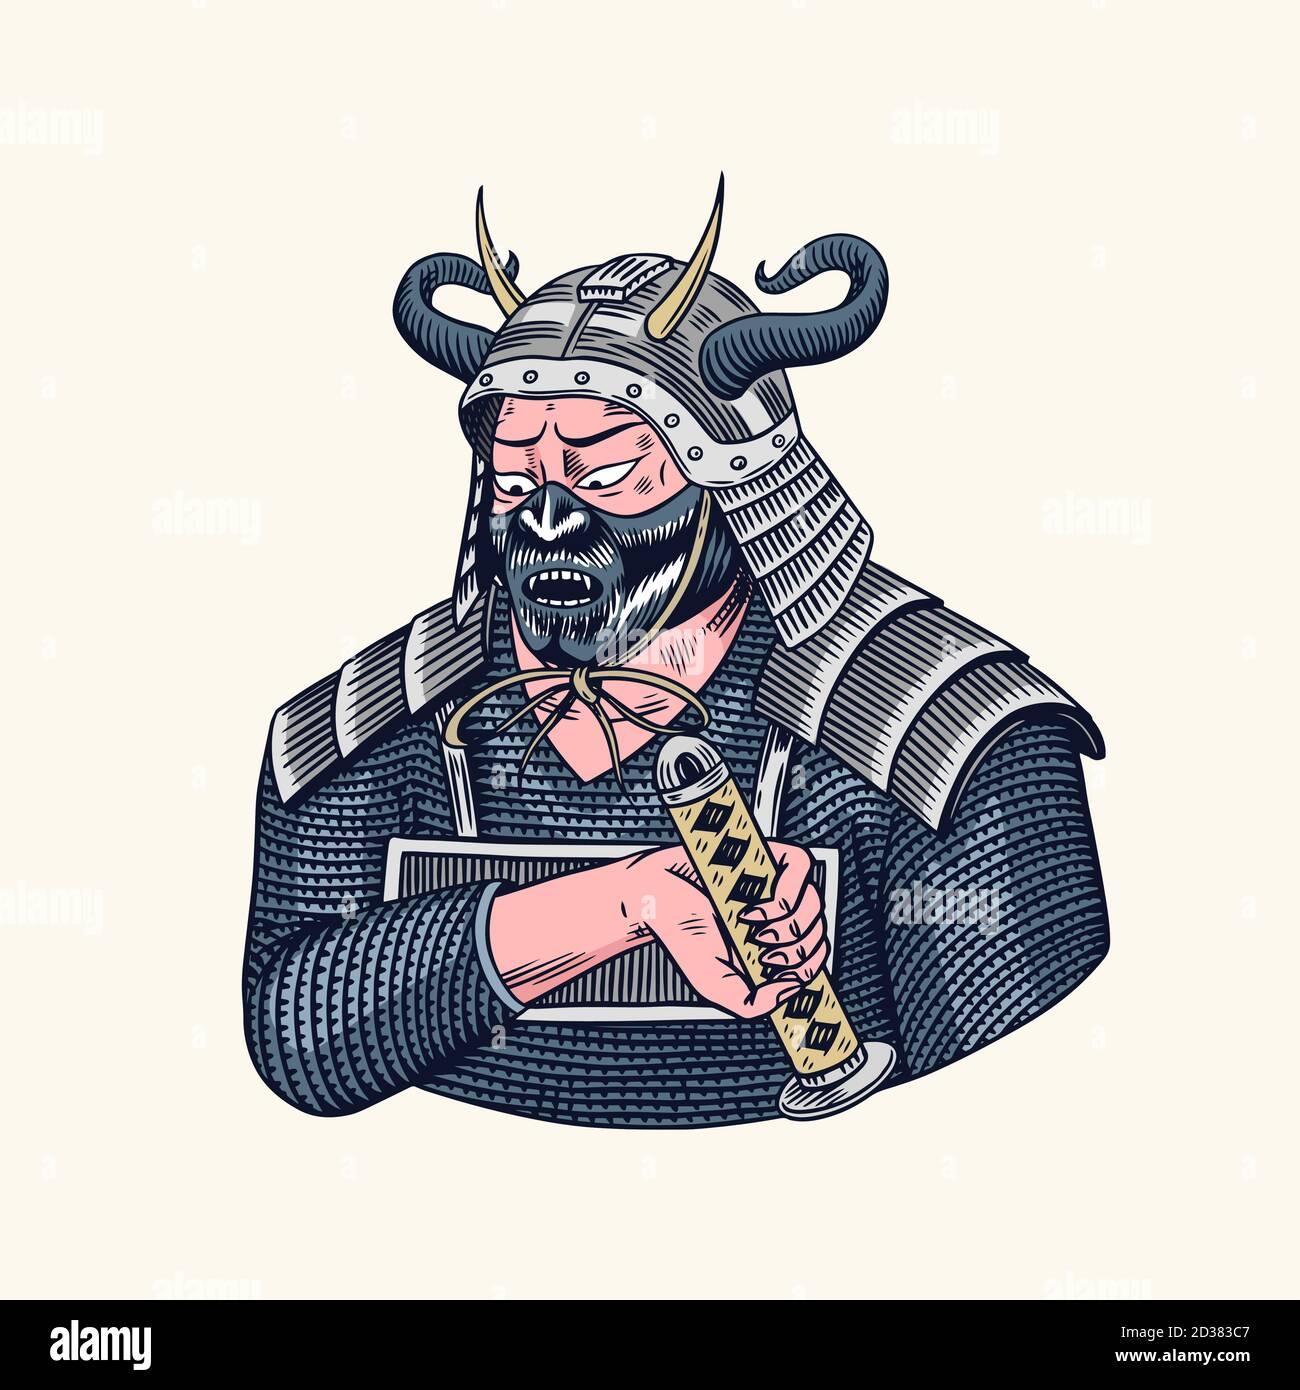 Japanese Samurai Illustration Samurai High Resolution Stock Photography And Images Alamy